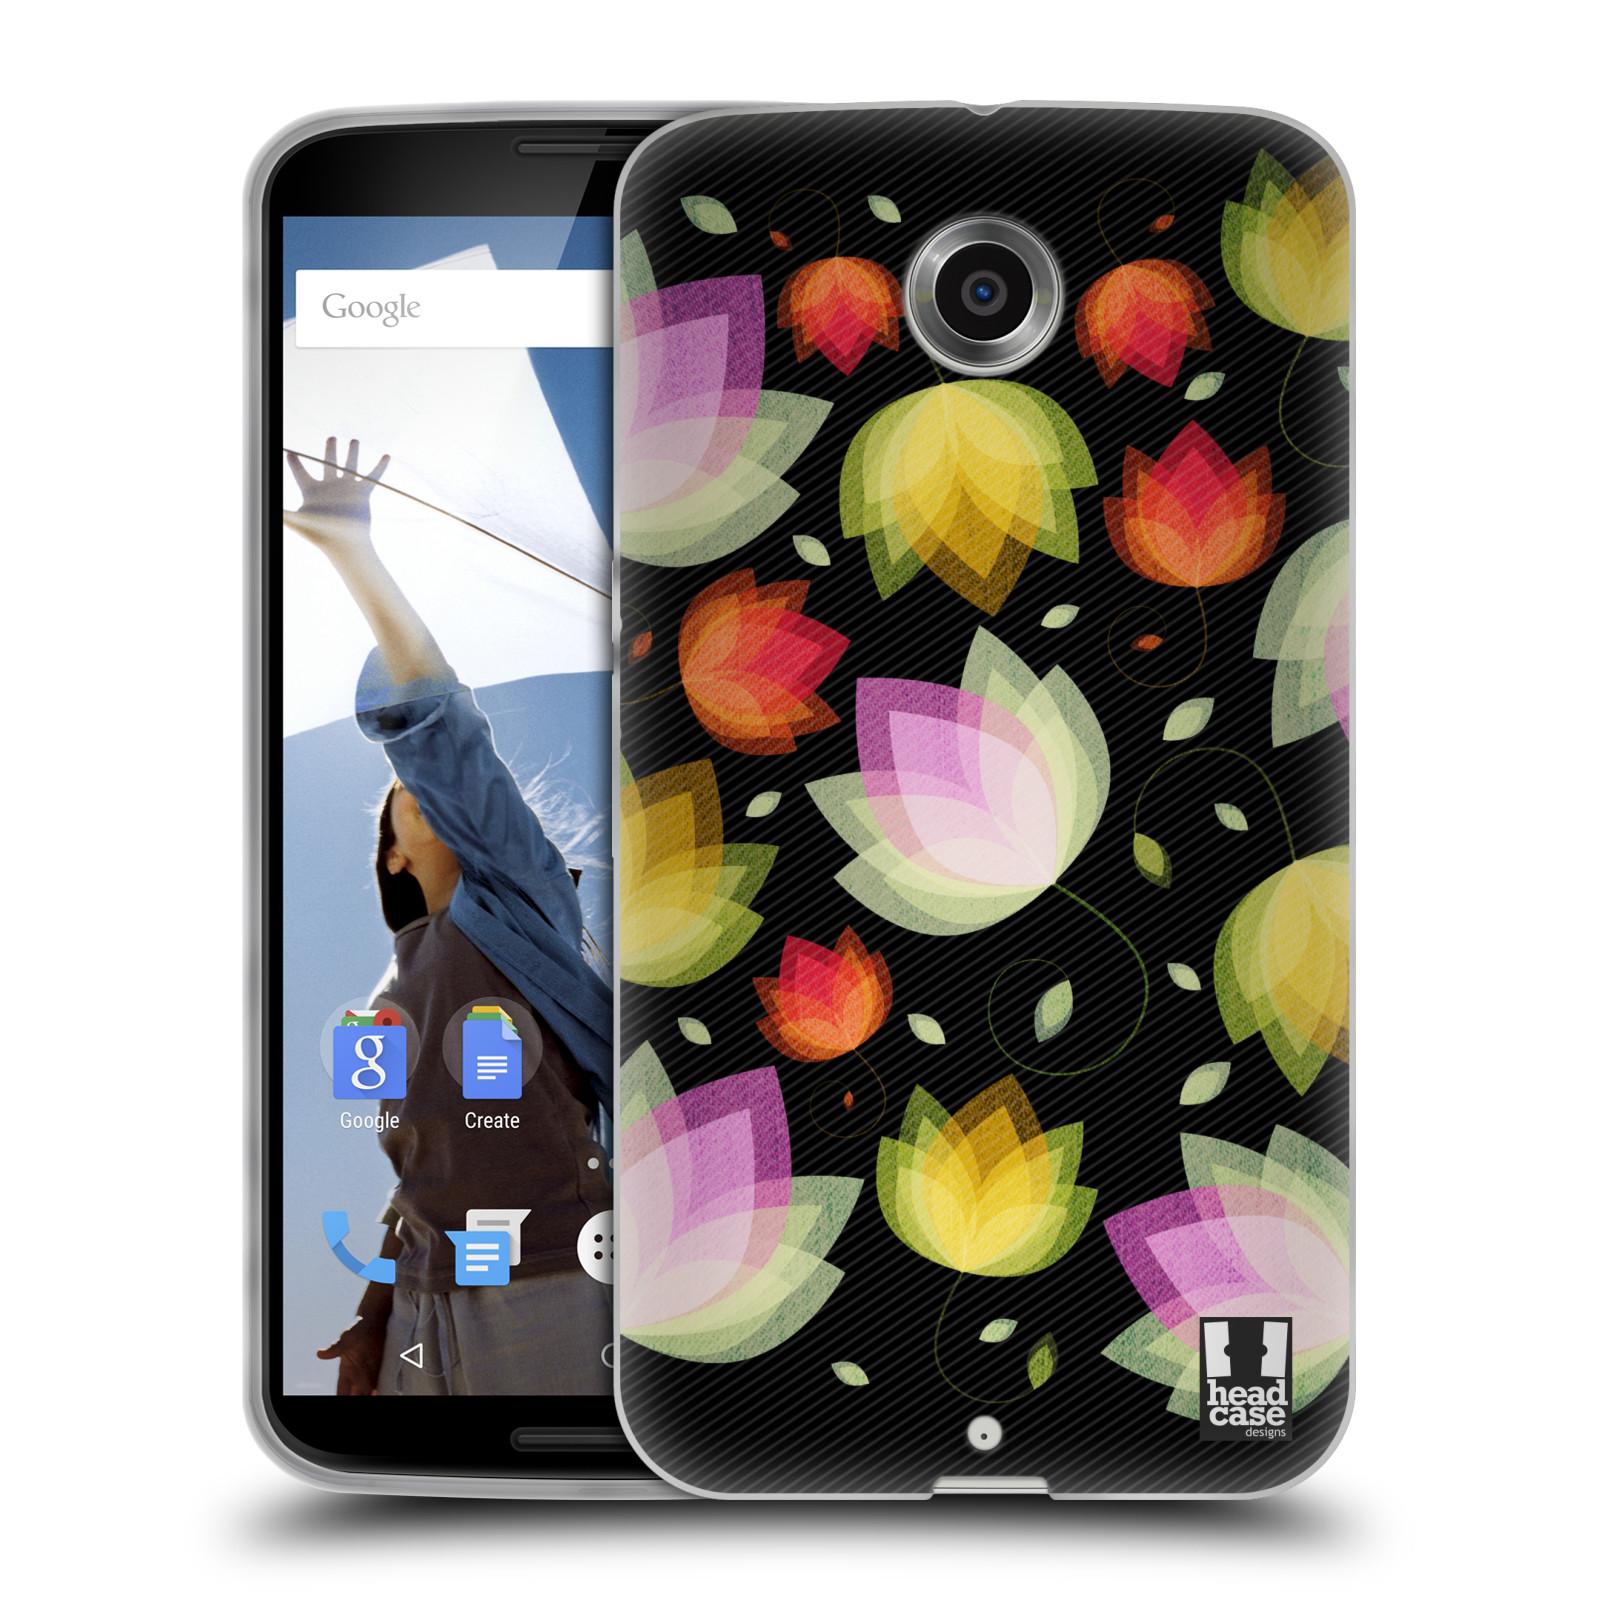 HEAD-CASE-DESIGNS-PATTERN-MIXED-UP-SOFT-GEL-CASE-FOR-MOTOROLA-PHONES